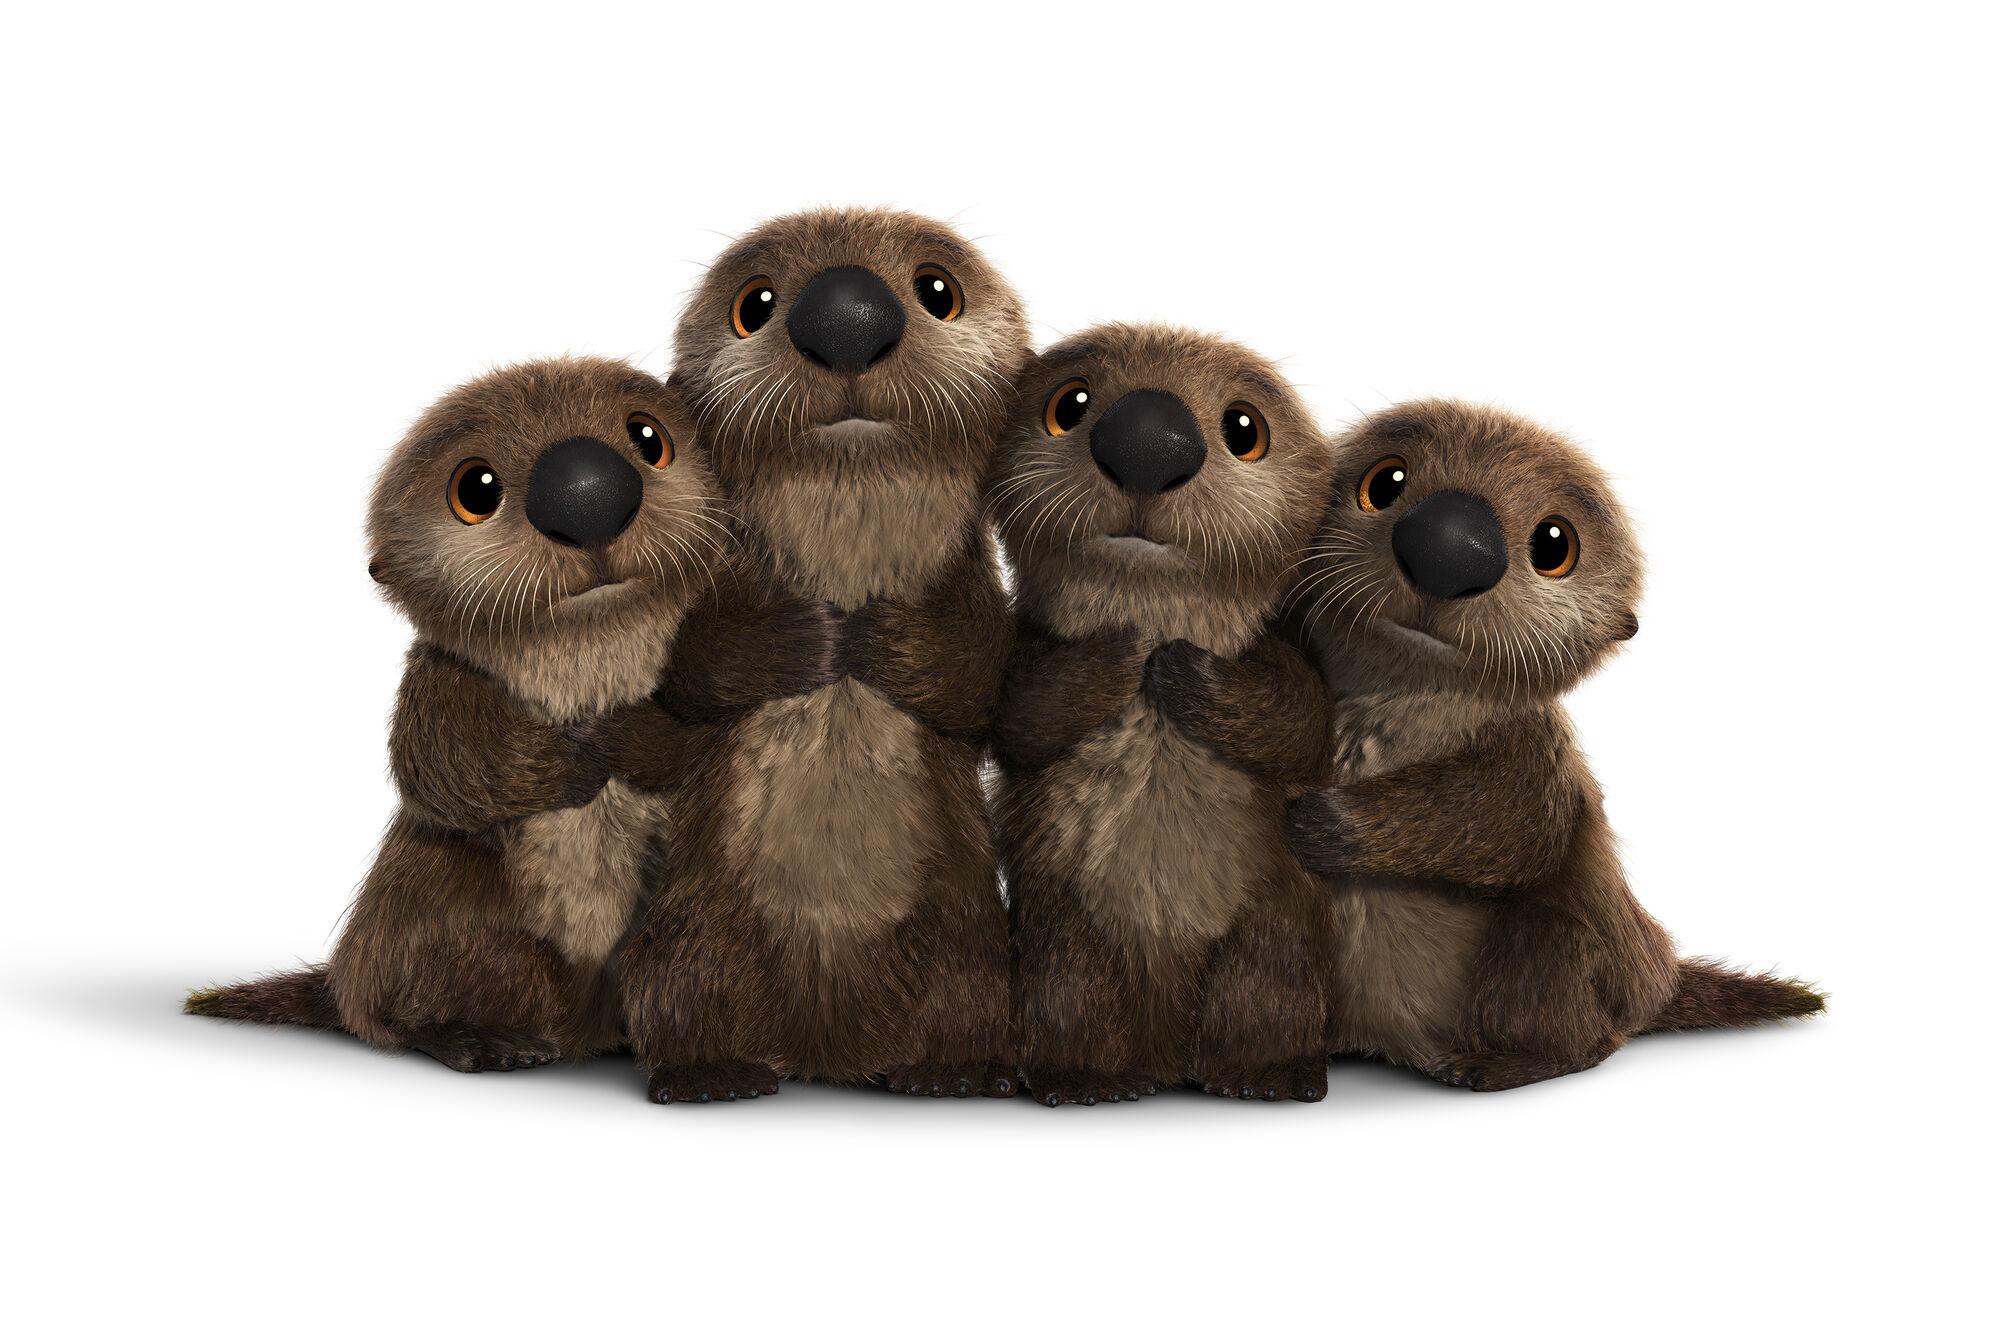 Otters disney wiki.